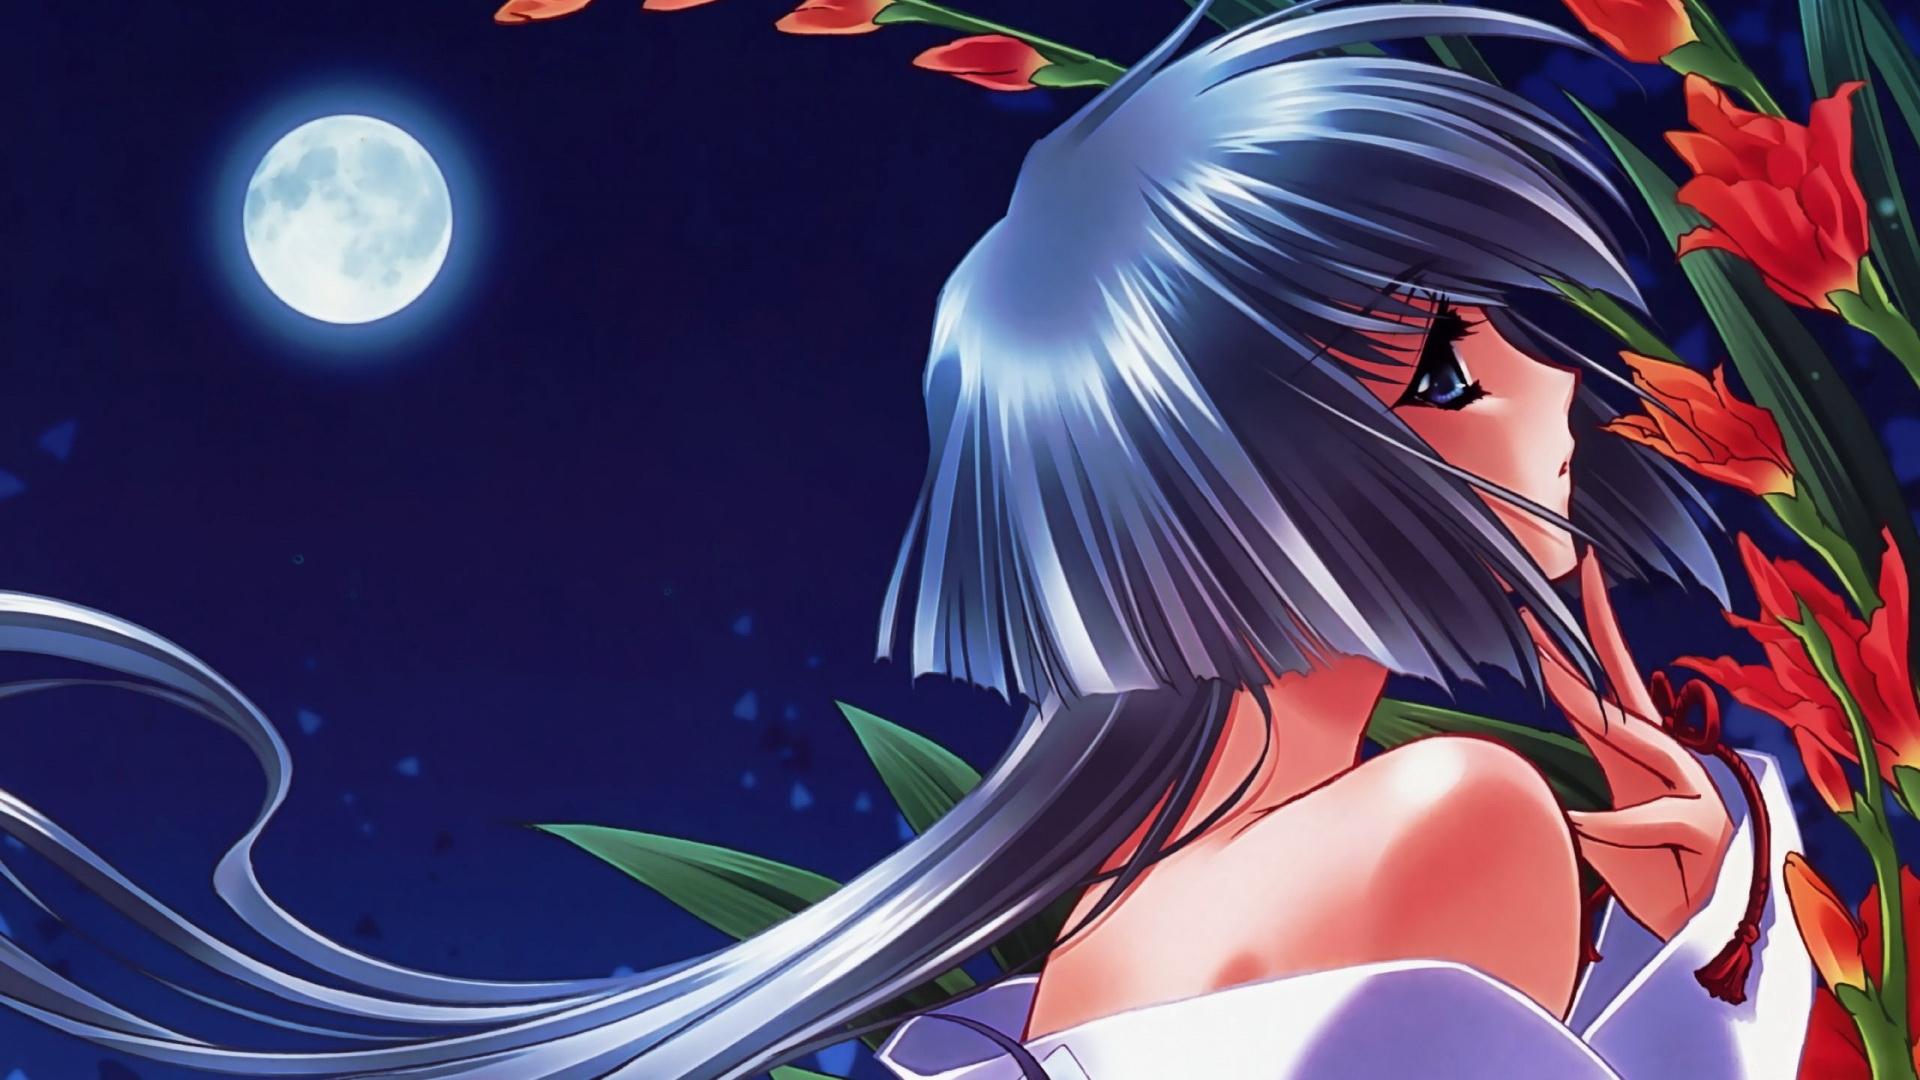 Download Wallpaper 1920x1080 Girl Pin Up Moon Flowers Night